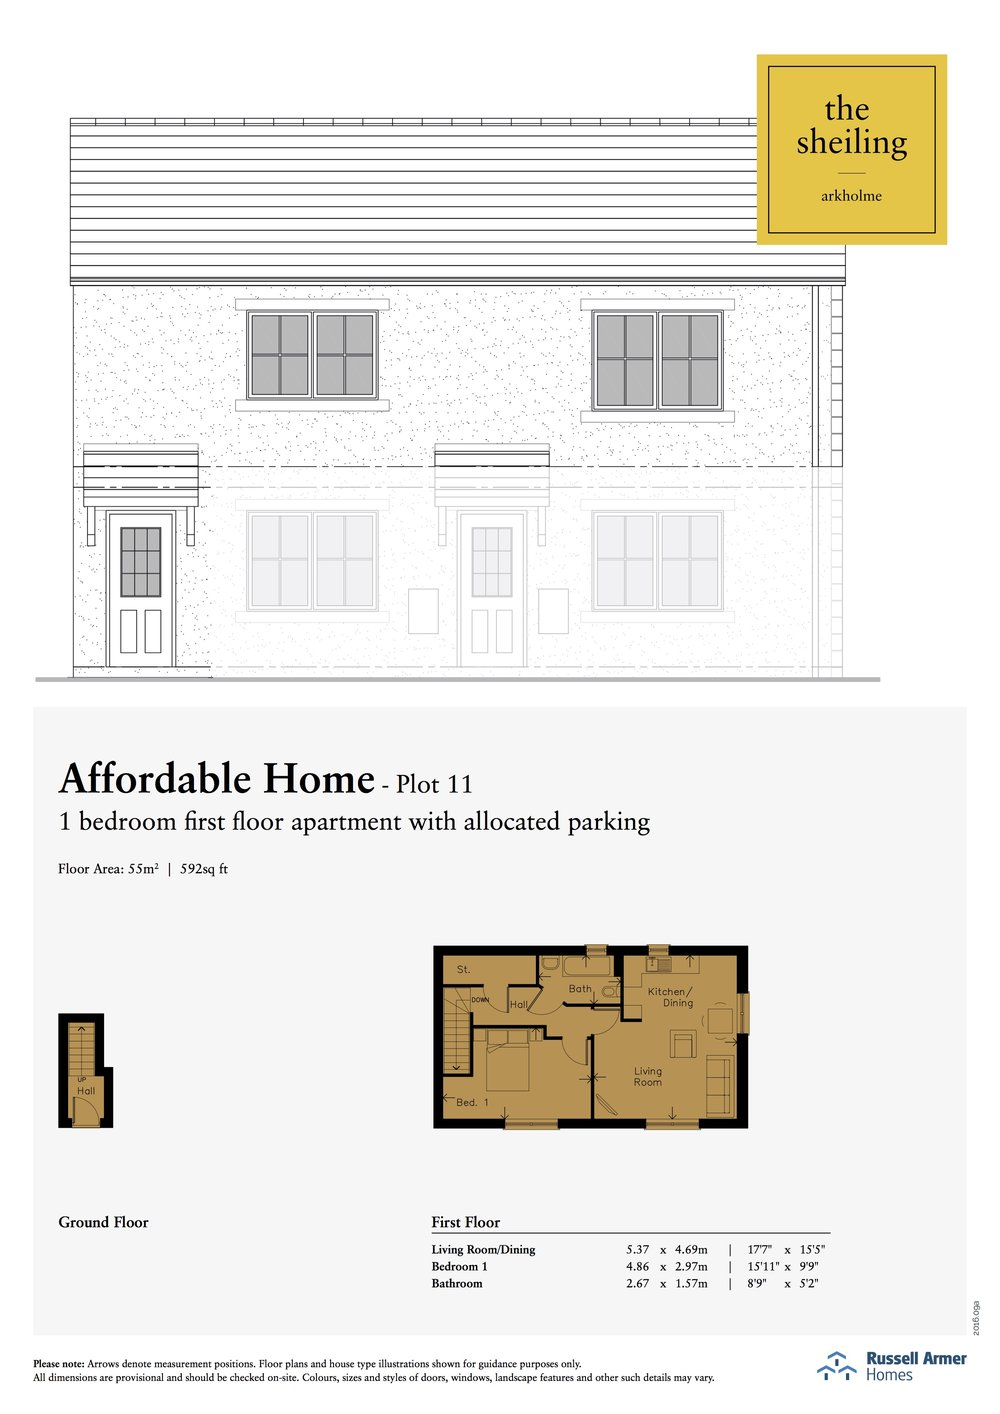 Affordable-Home_Plot-11.jpg